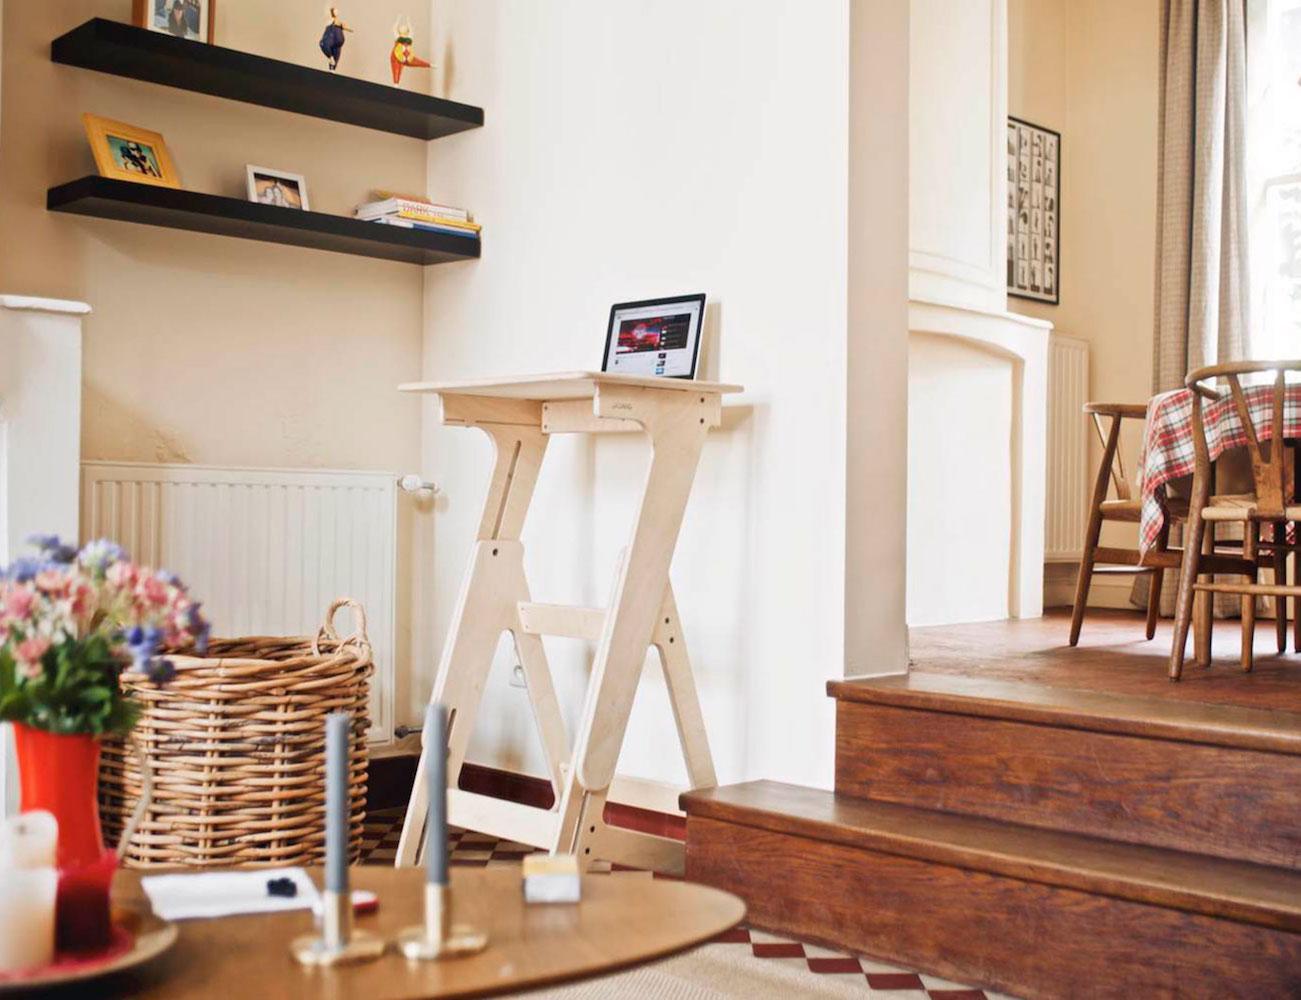 Jaswig StandUp – Height Adjustable Desk